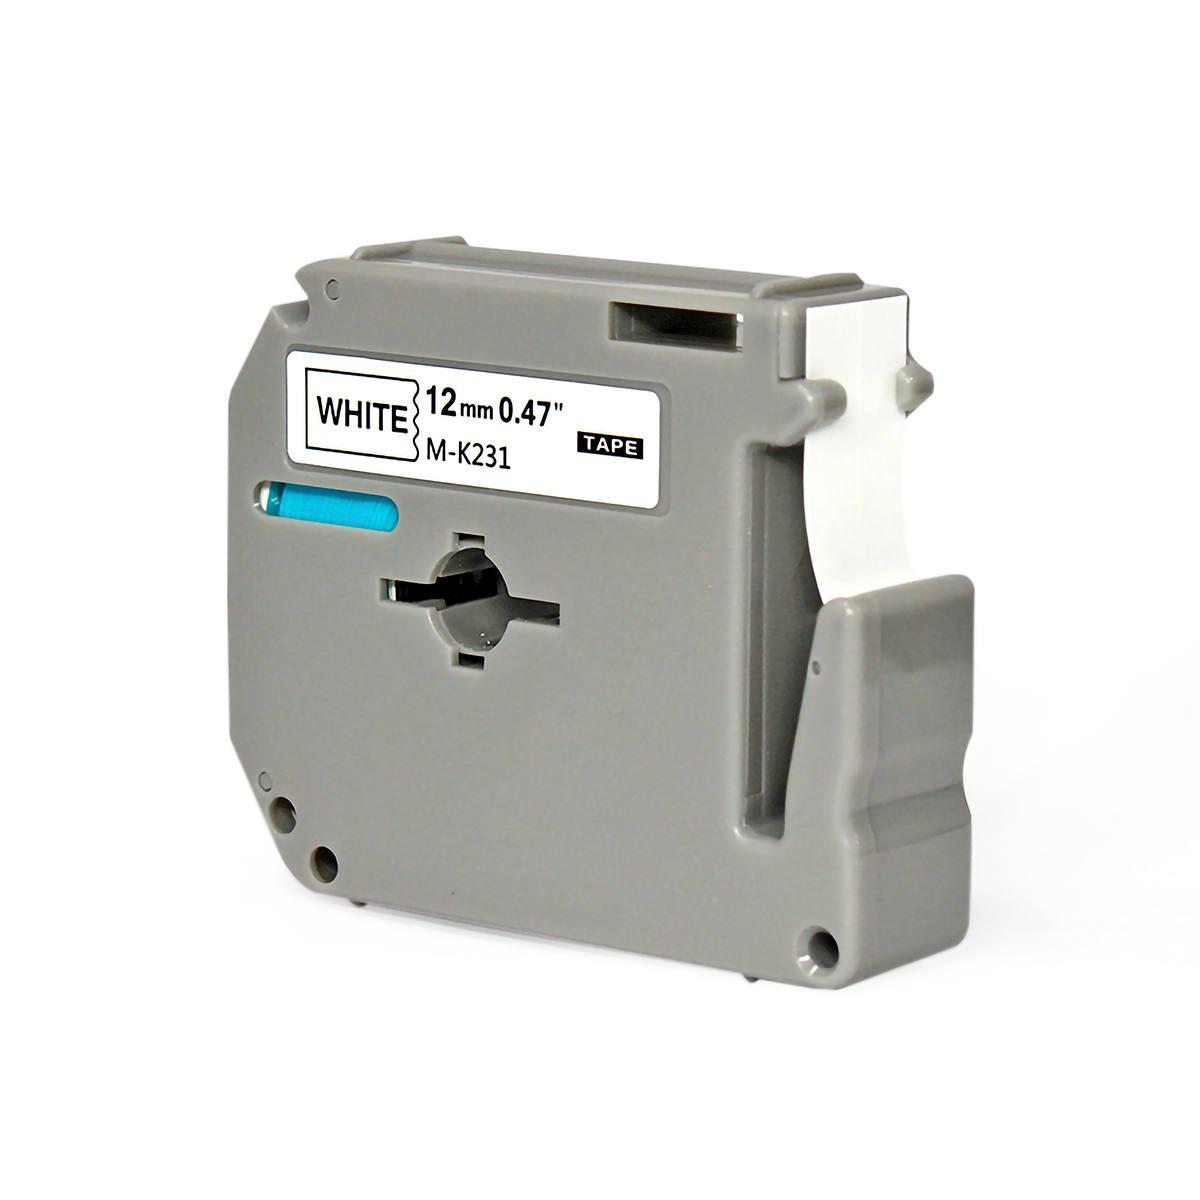 Fita Compatível para Rotulador 12mm x 8m Branco/Preto Marca X-Full Referência M-K231 M231 MK231 para Brother PT-80 PT-70